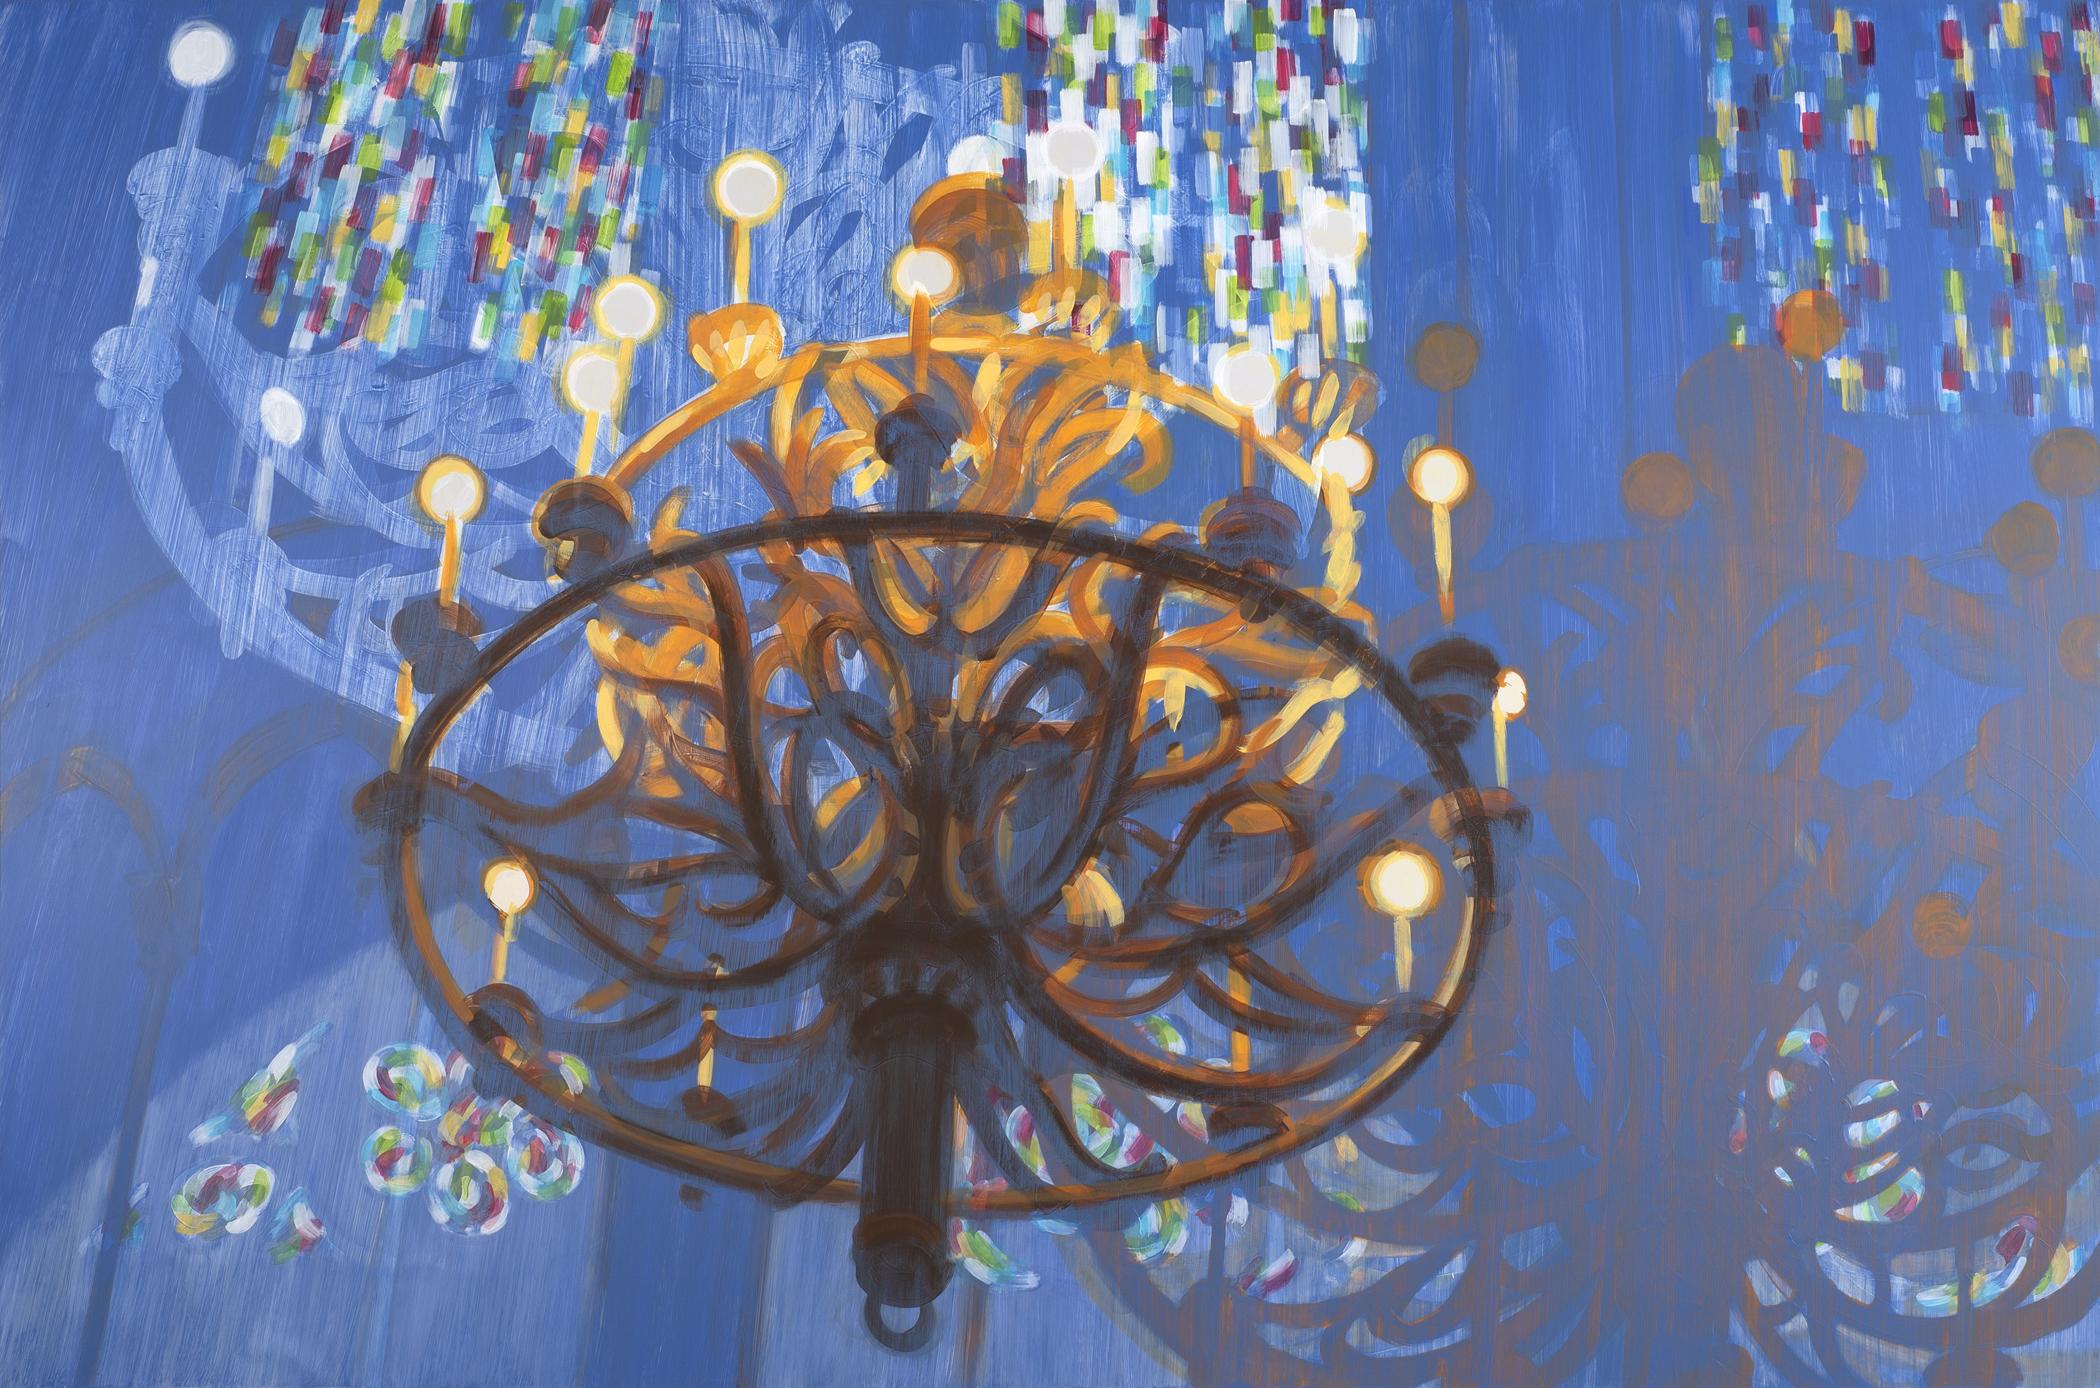 Notre Dame Paris 2019 acrylic on ACM 40x60in